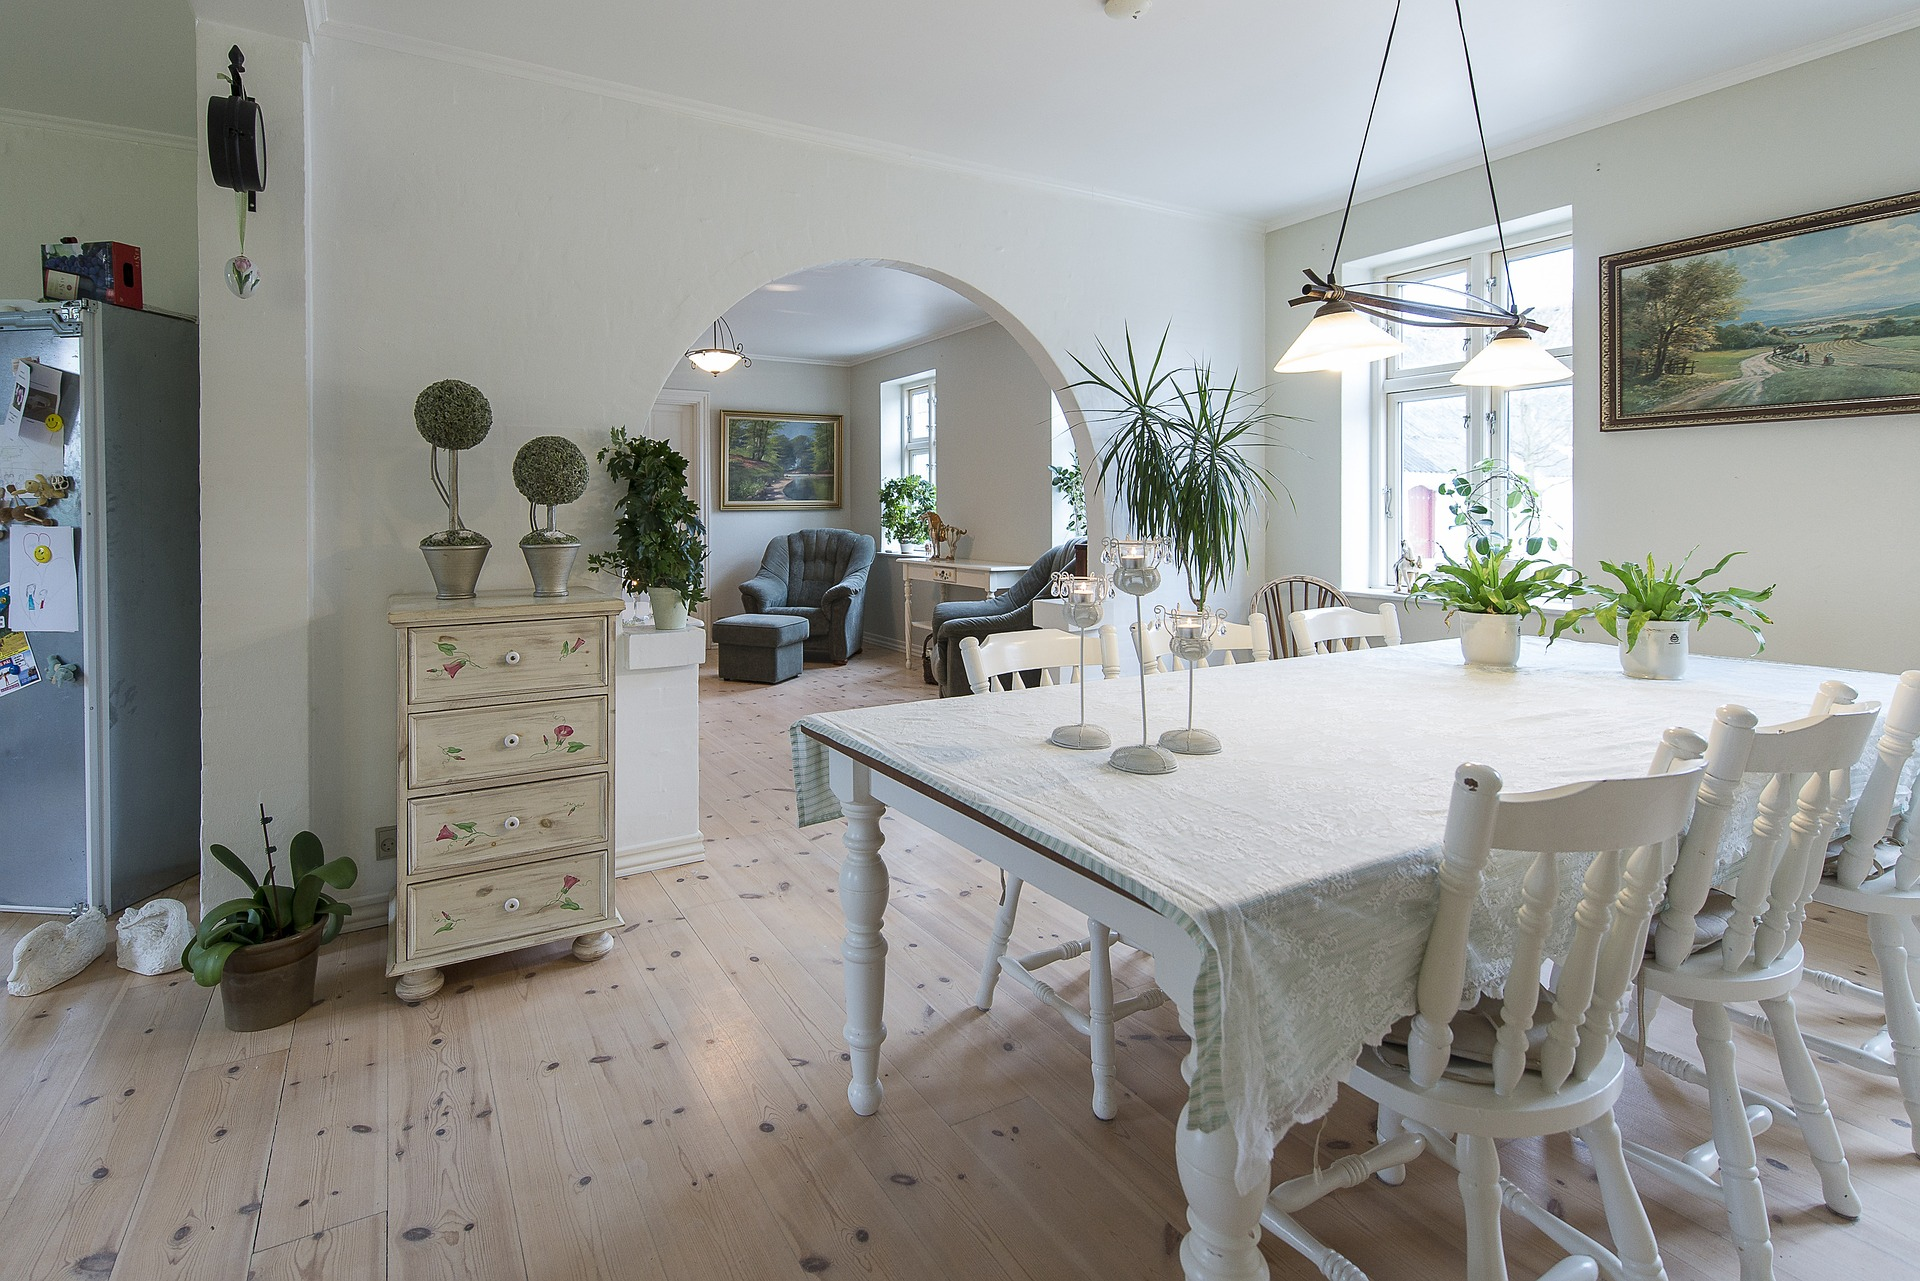 sala con decoración blanca